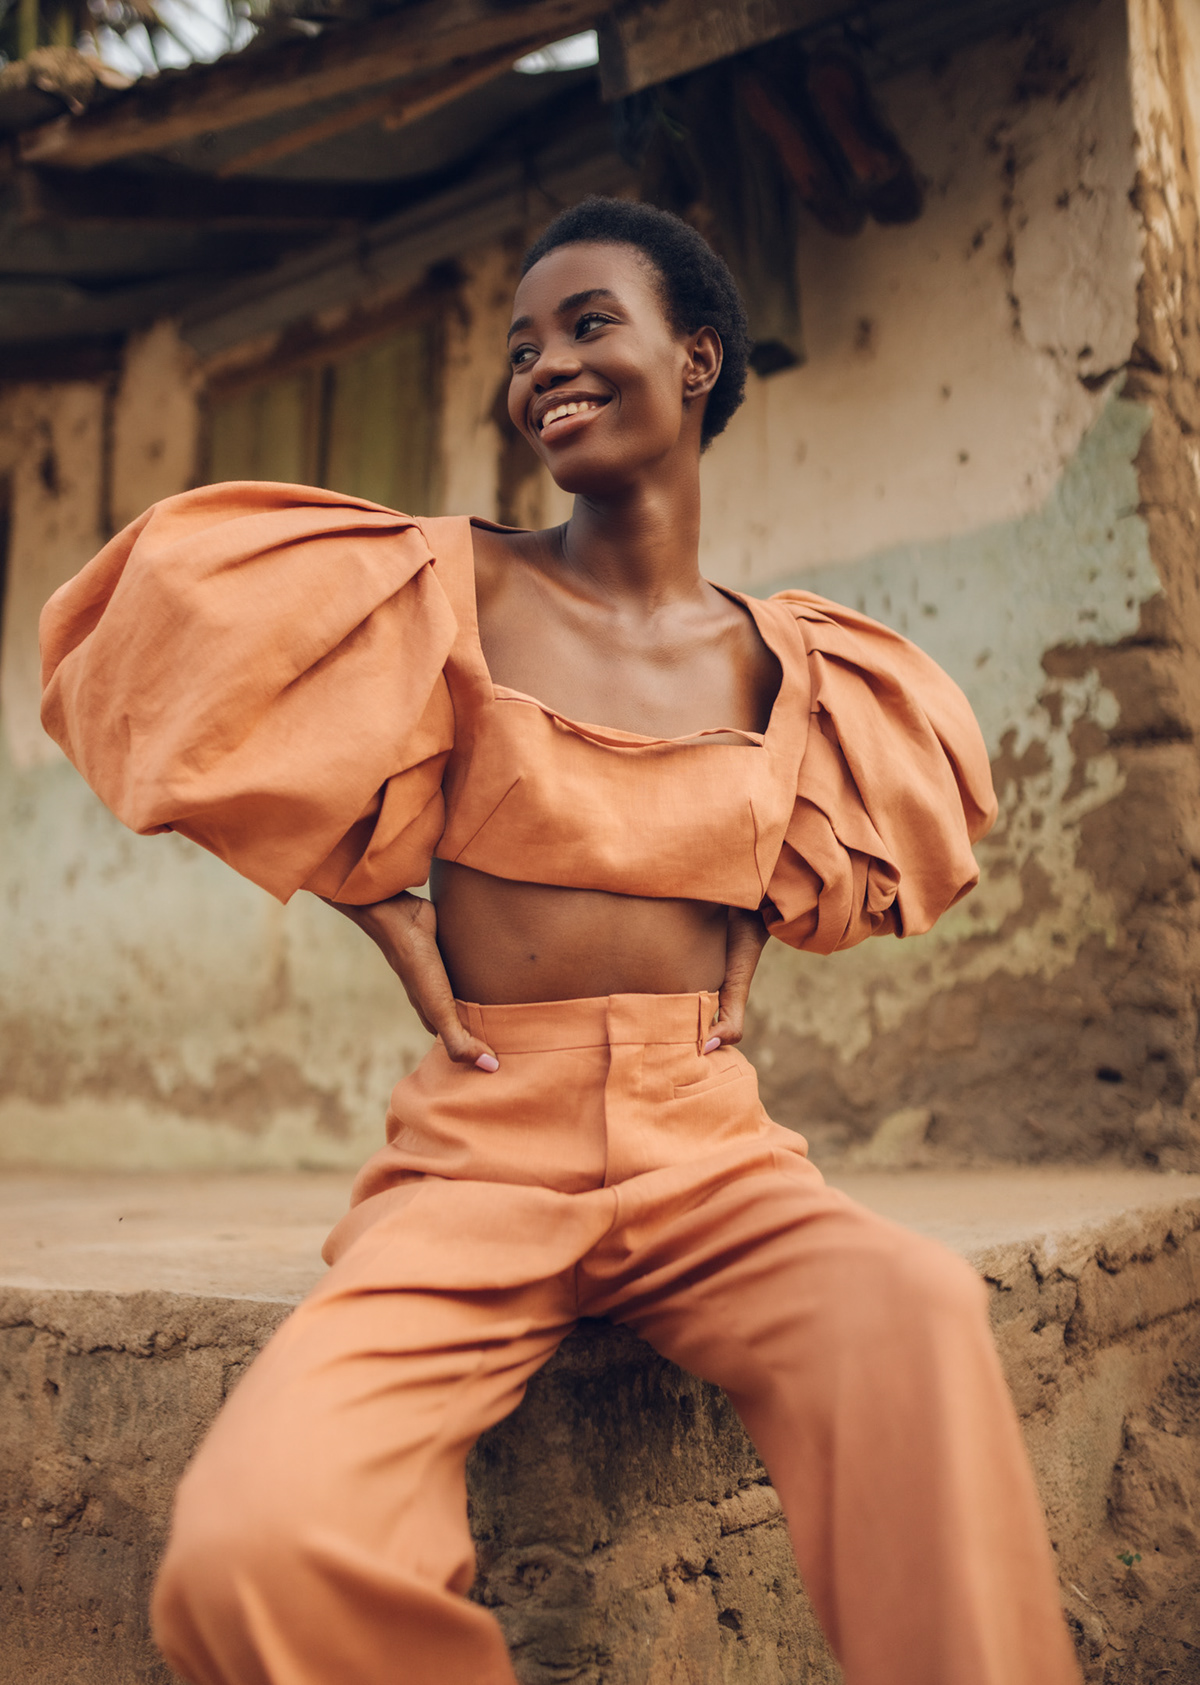 adobe AdobeLightroom adobephotoshop Canon carlosidun getaway Ghana lightroom vogue voguenederland